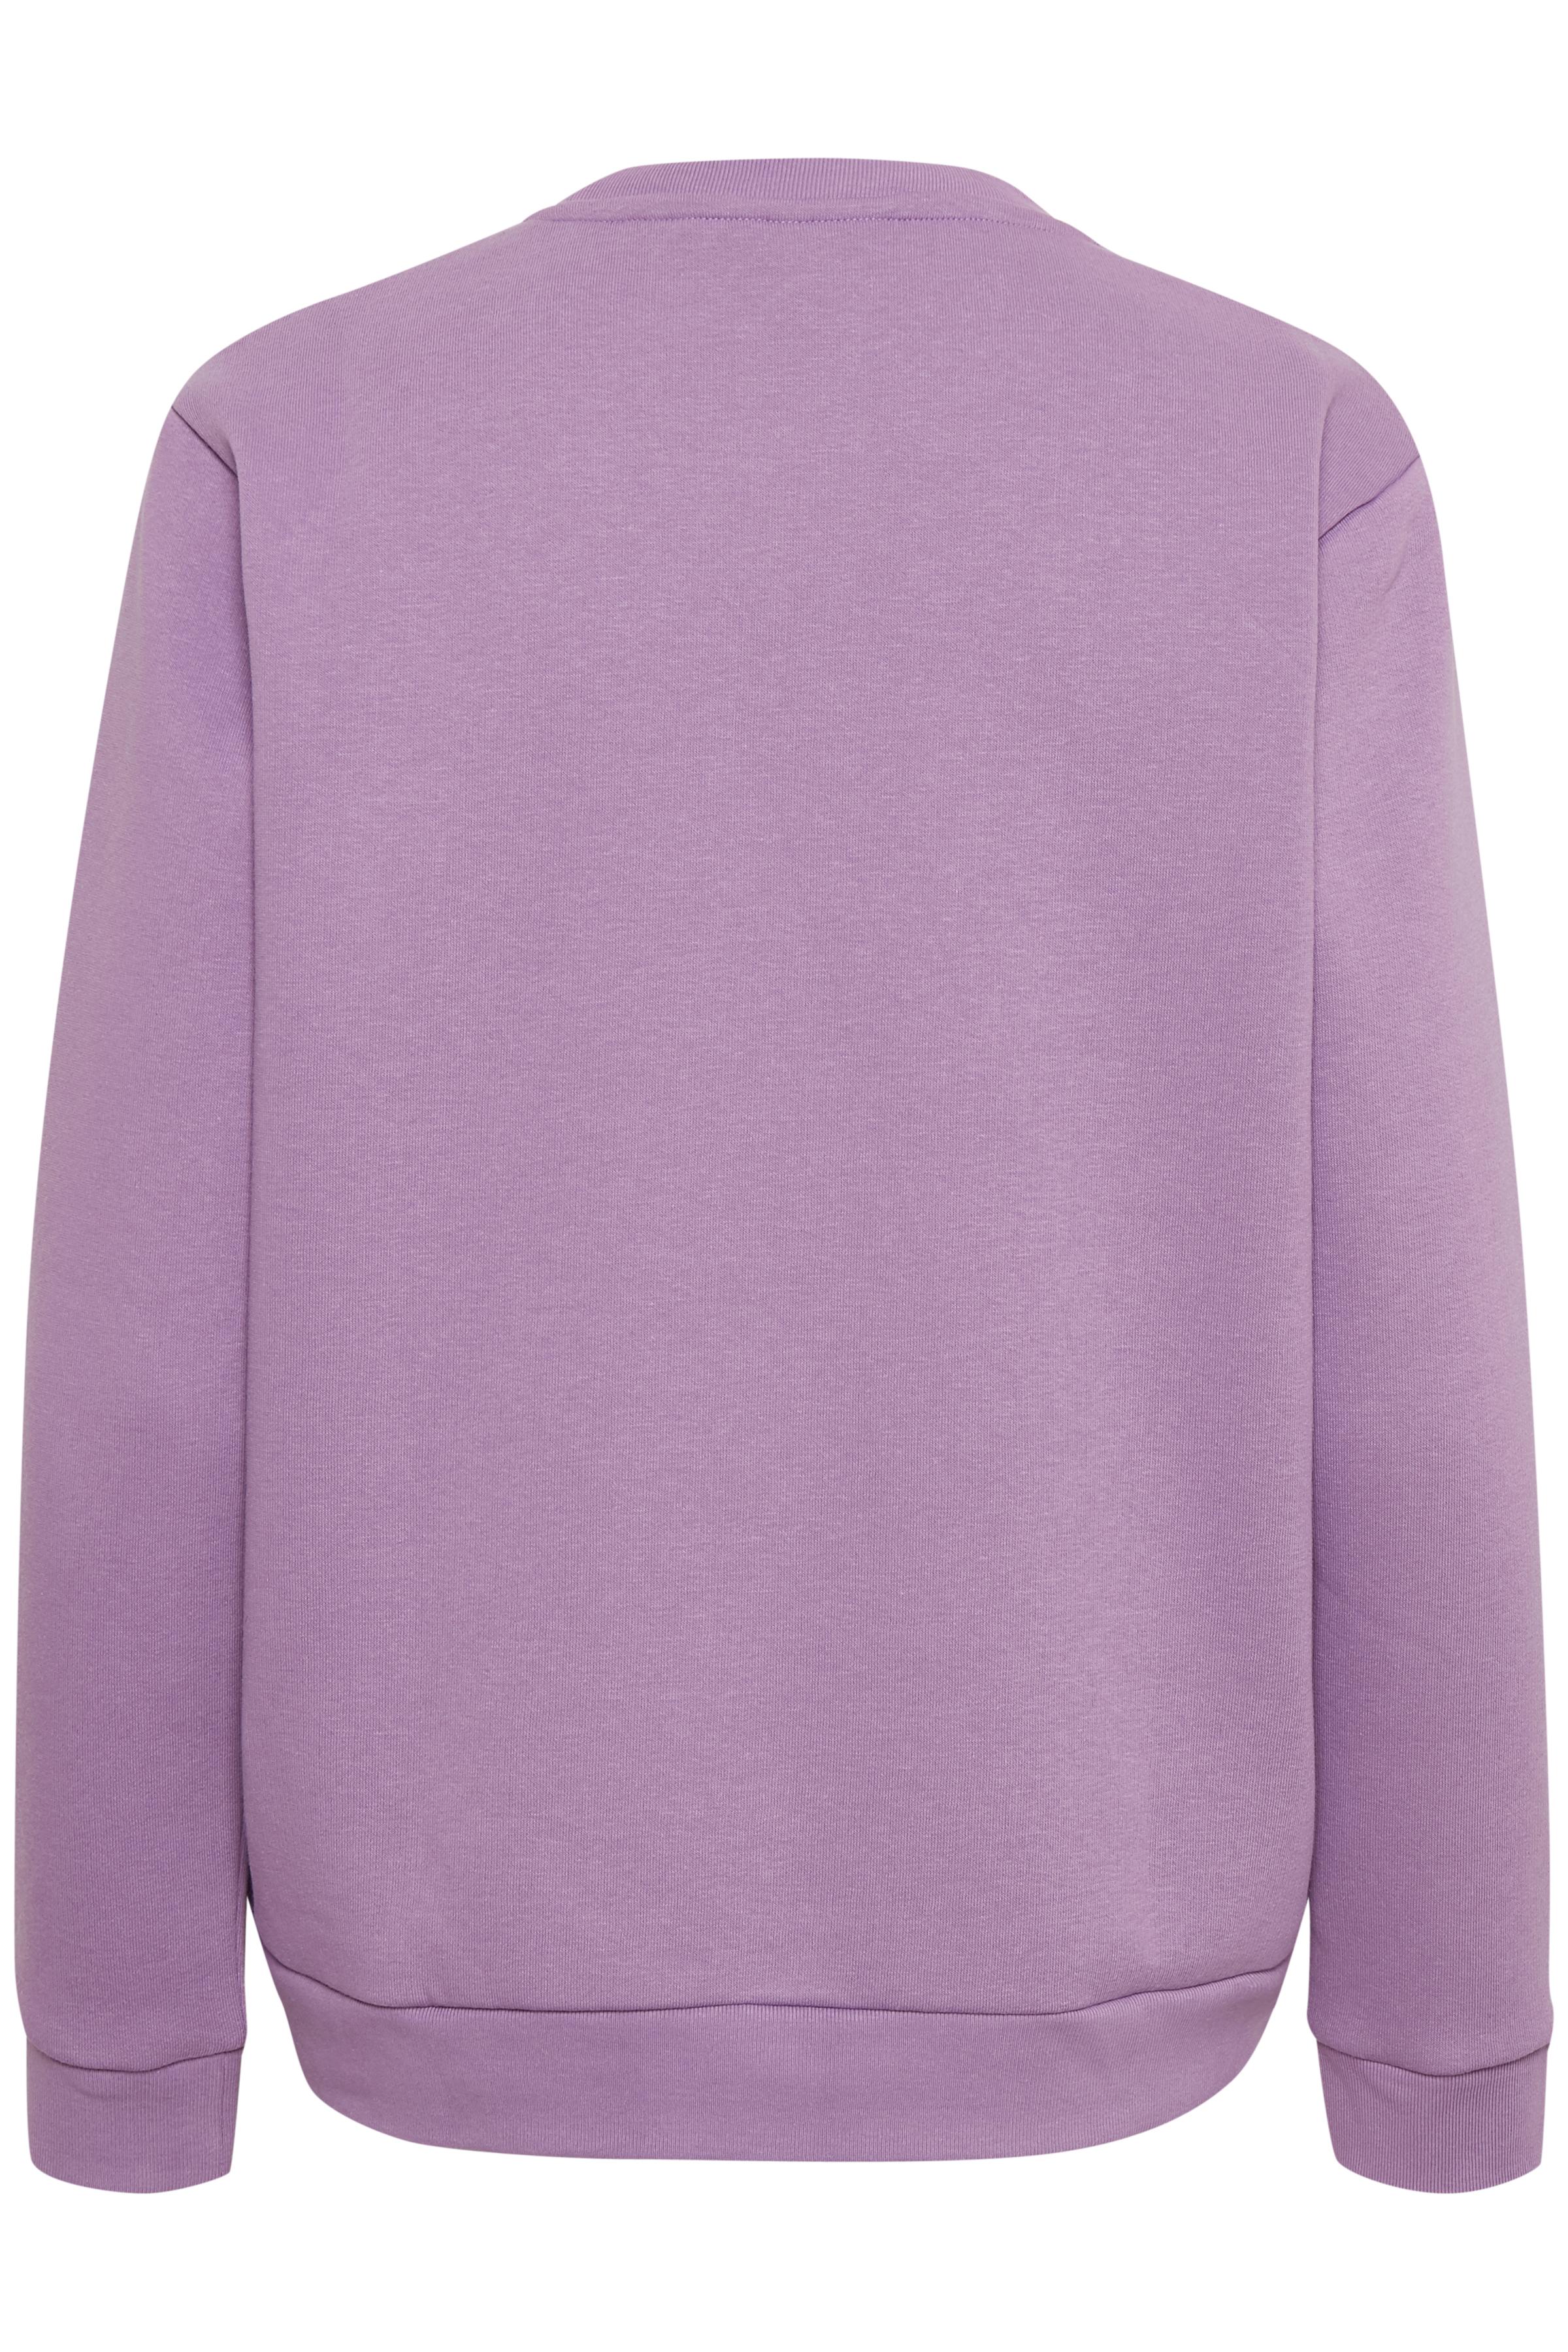 Lys lilla Sweatshirt fra b.young – Køb Lys lilla Sweatshirt fra str. XS-XXL her